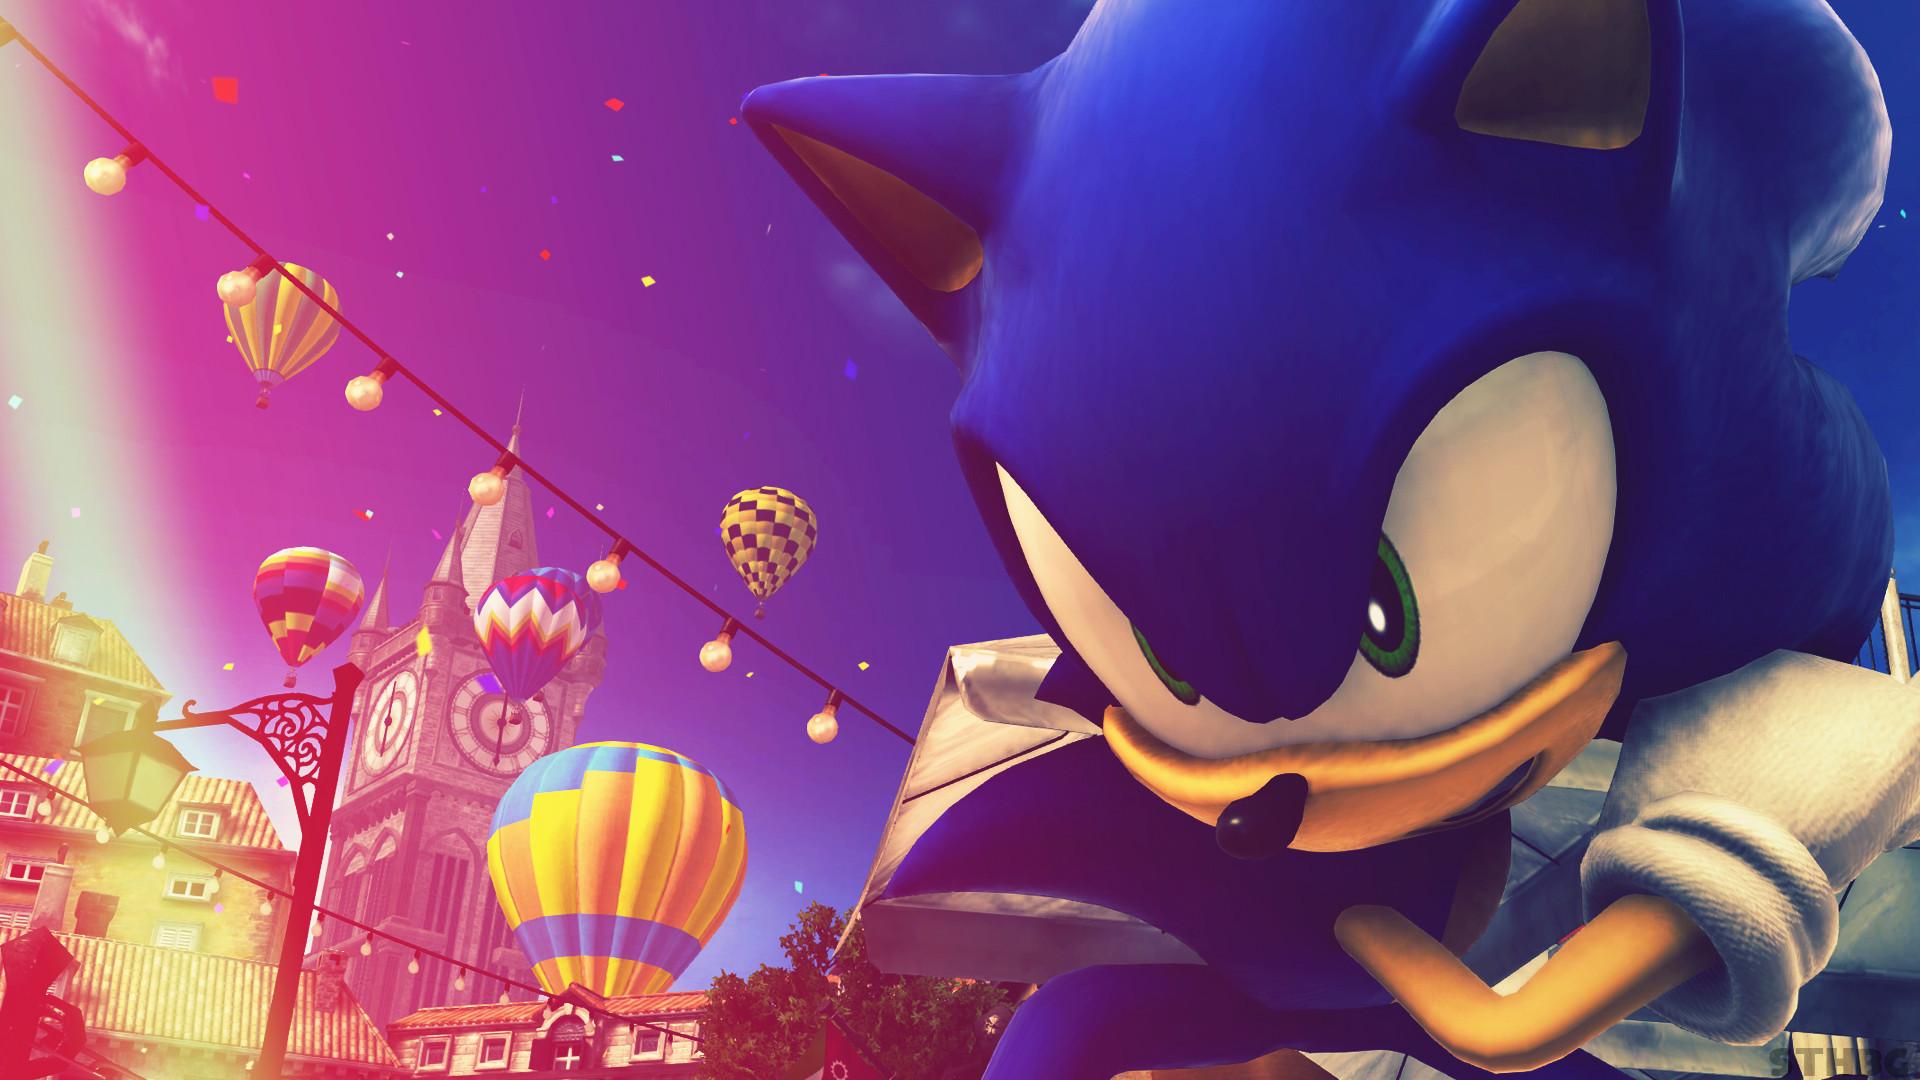 Res: 1920x1080, ... SonicTheHedgehogBG Sonic The Hedgehog - Wallpaper by SonicTheHedgehogBG